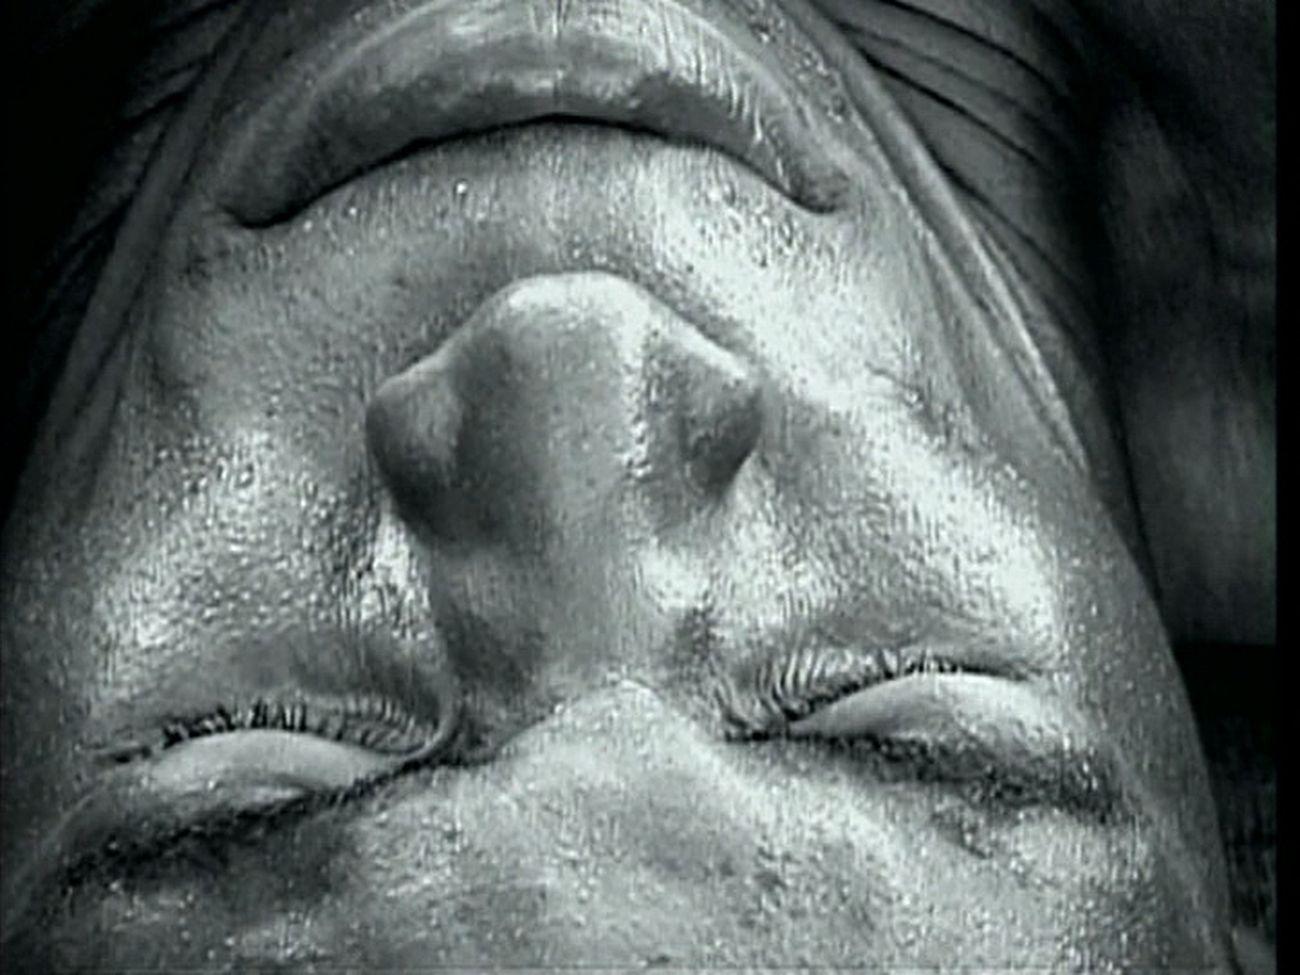 Zwelethu Mthethwa, Flex, 2002, still da video. Courtesy the artist & Han Nefkens Foundation, Barcellona